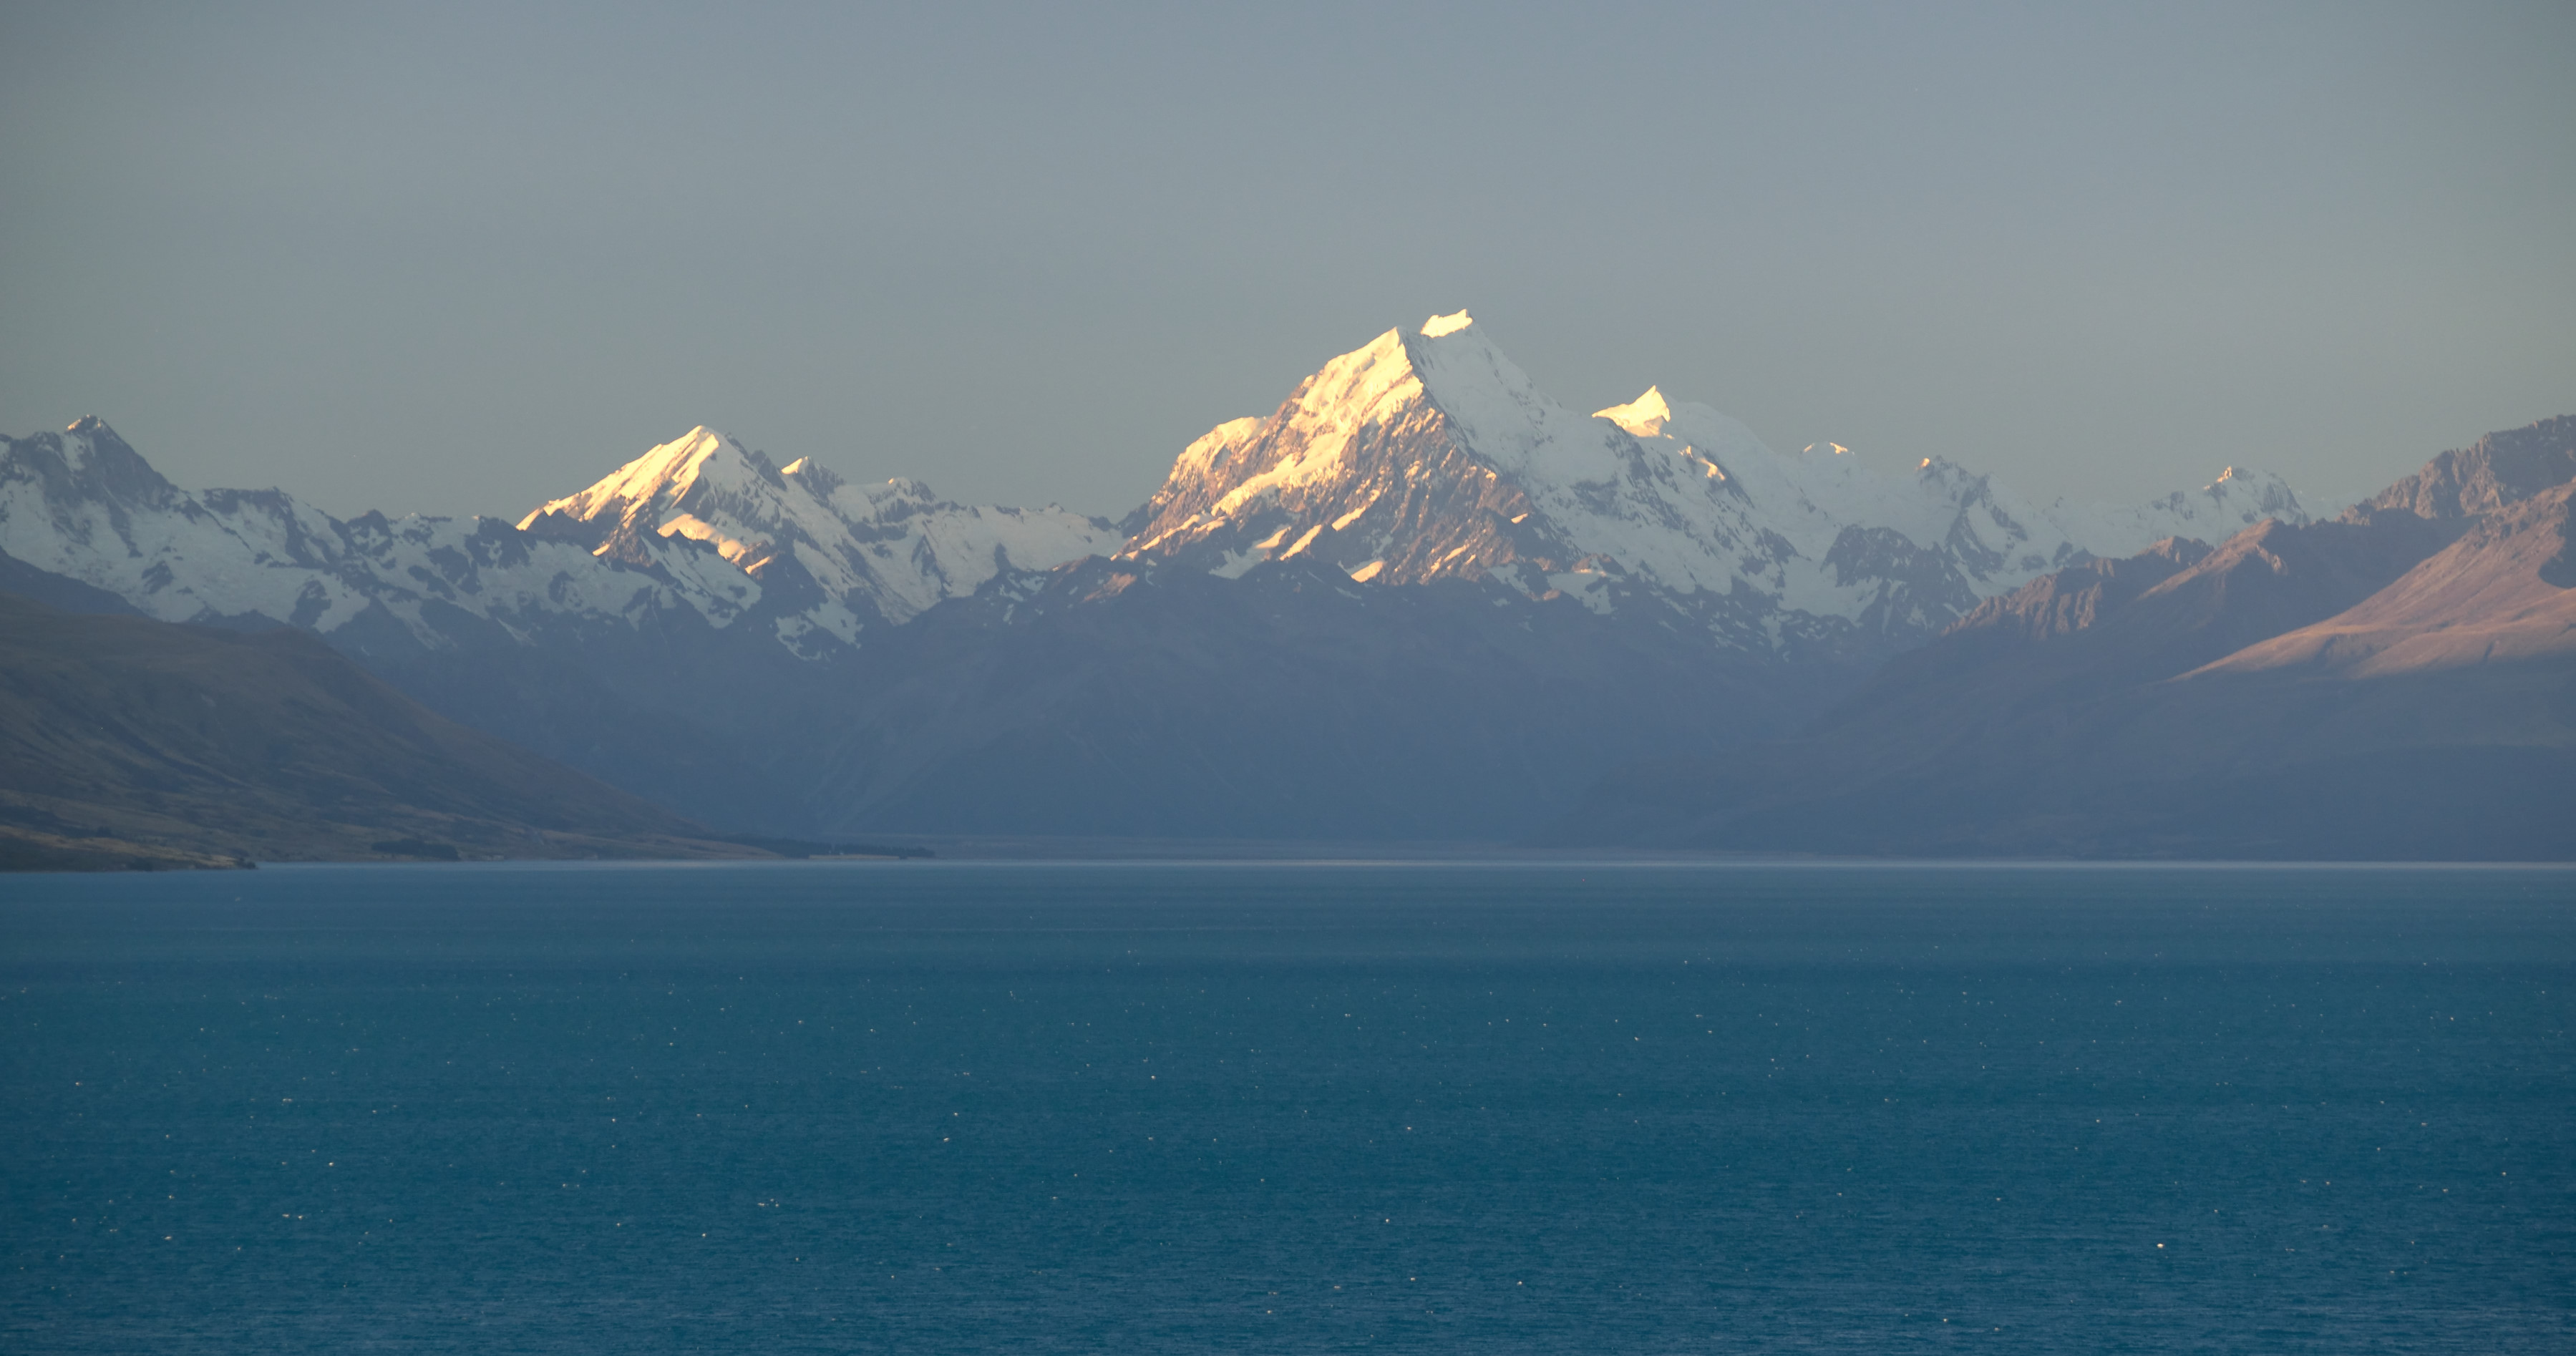 Aoraki Mount Cook from Pukaki